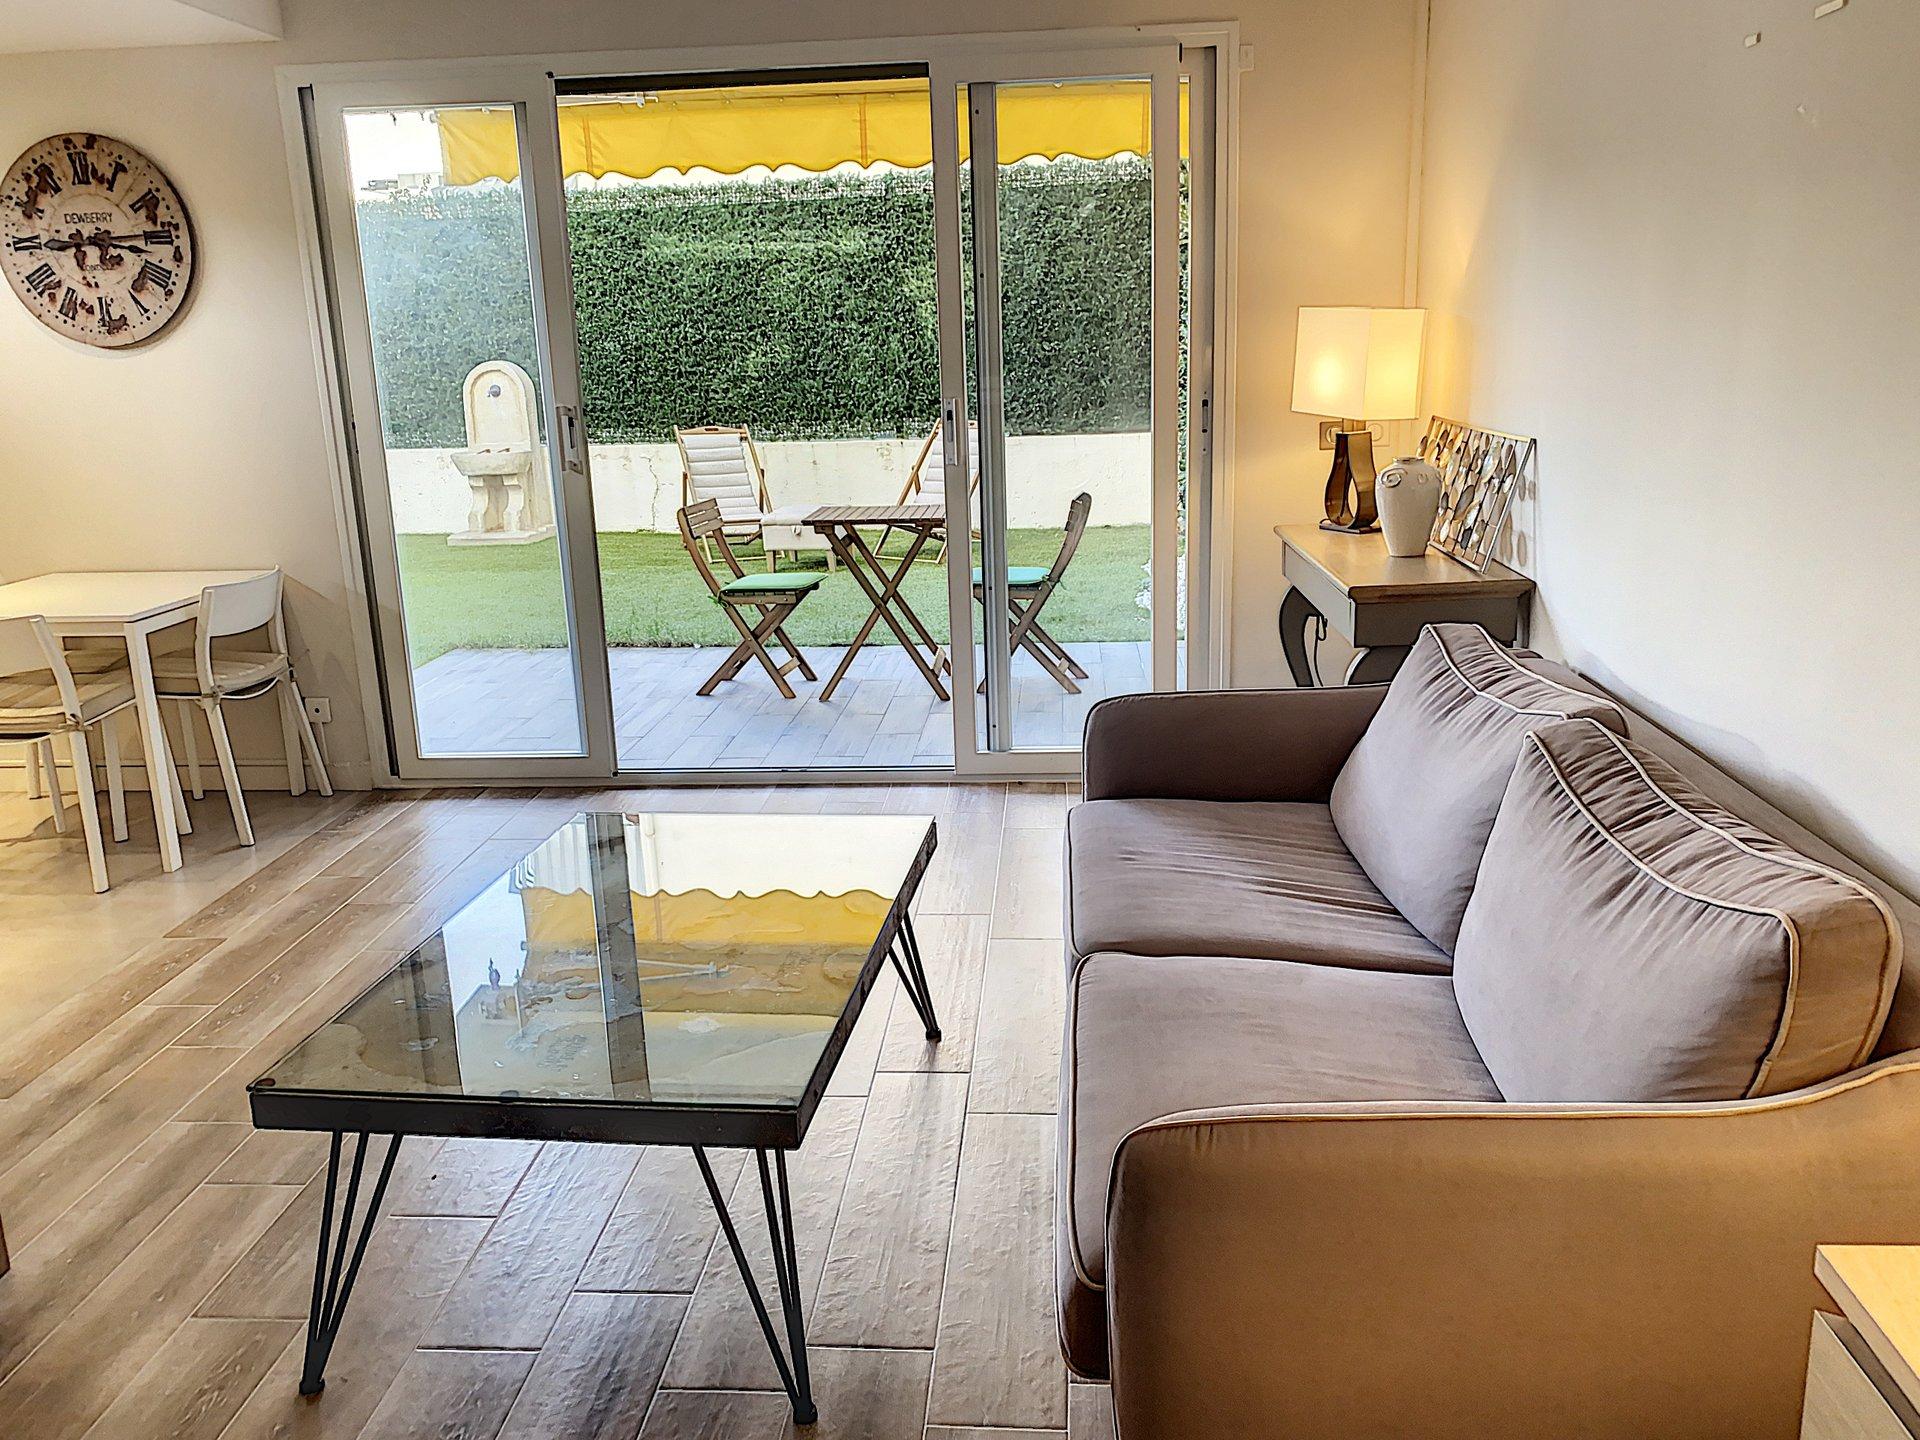 Cannes Palm Beach 2p 41 m2 garden 100 m2